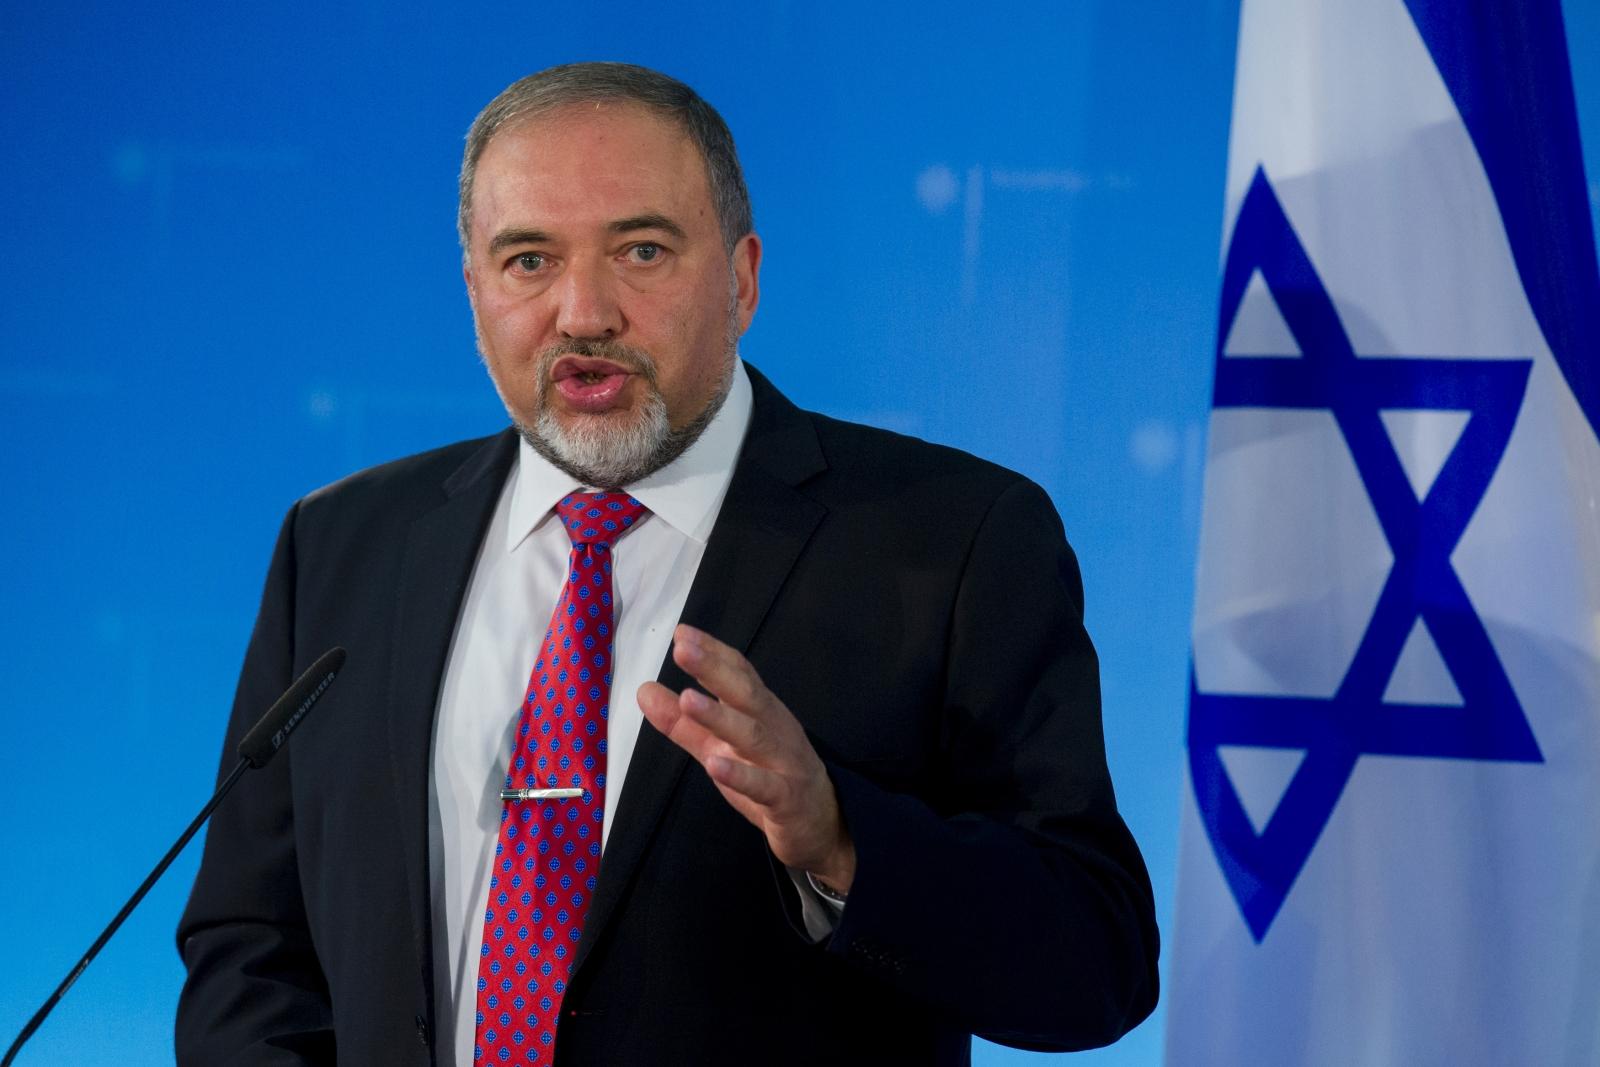 Israel Slams Sweden S Ikea Diplomacy Over Palestine